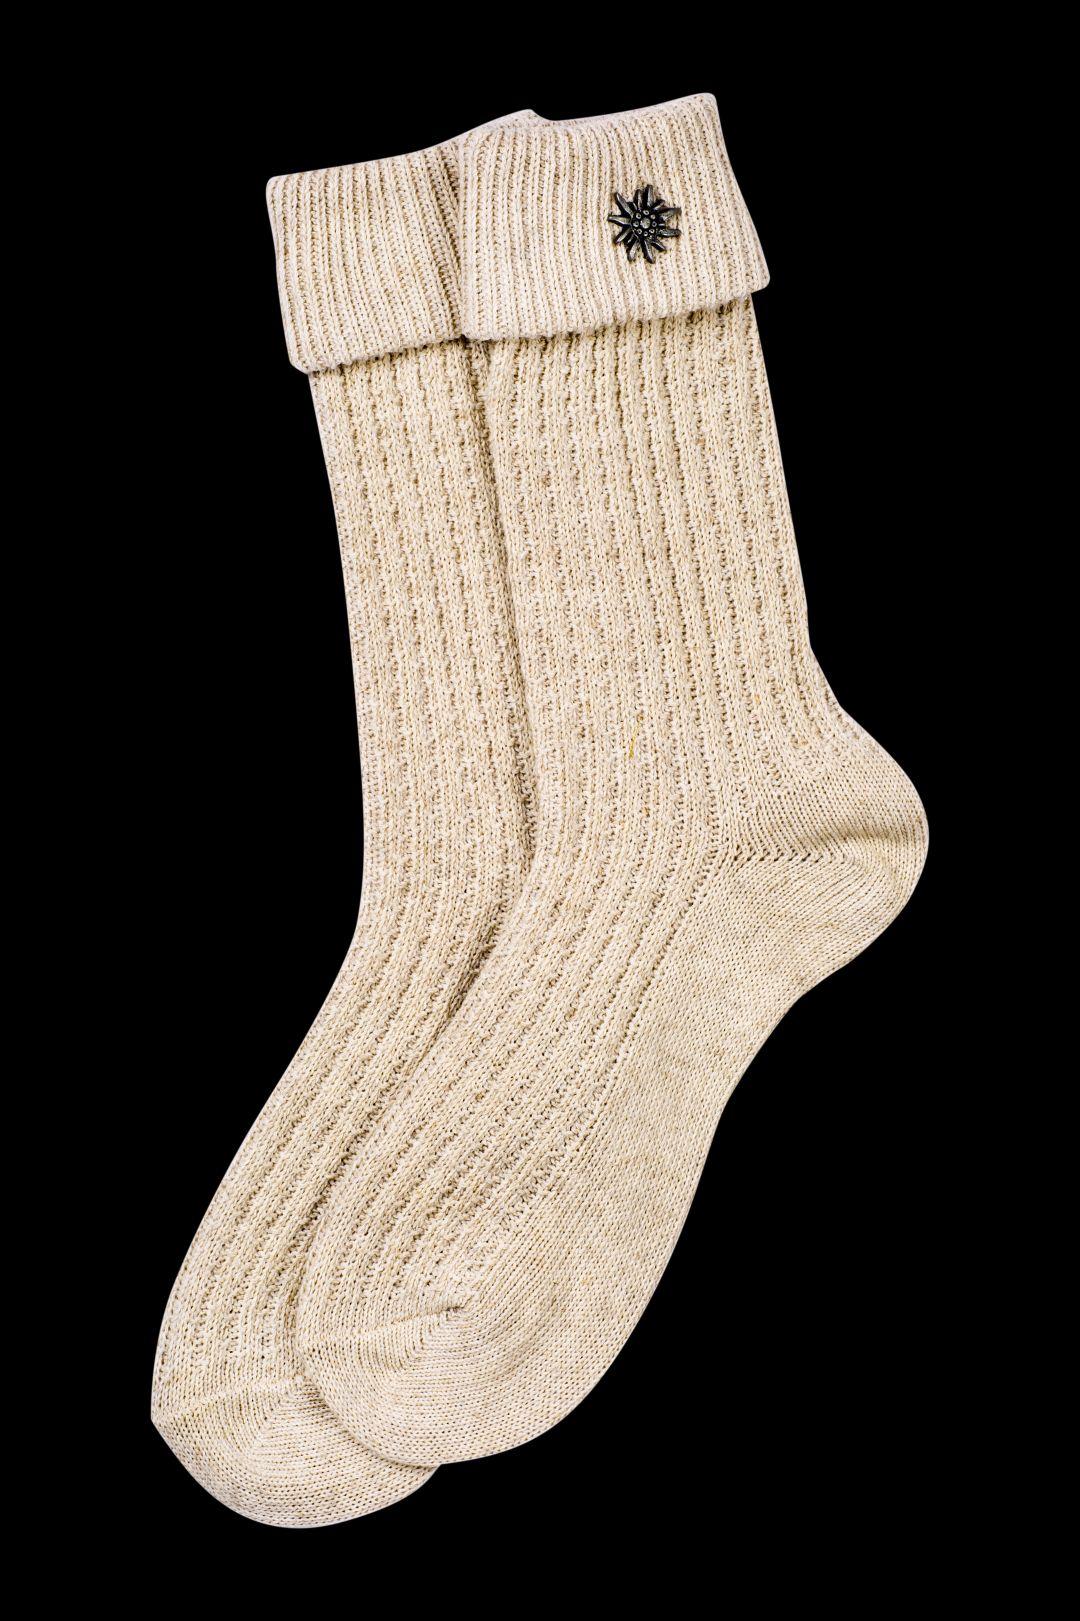 Trachten Dirndl Hosen Kniestrümpfe Socken Damen beige kurz Zopfmuster